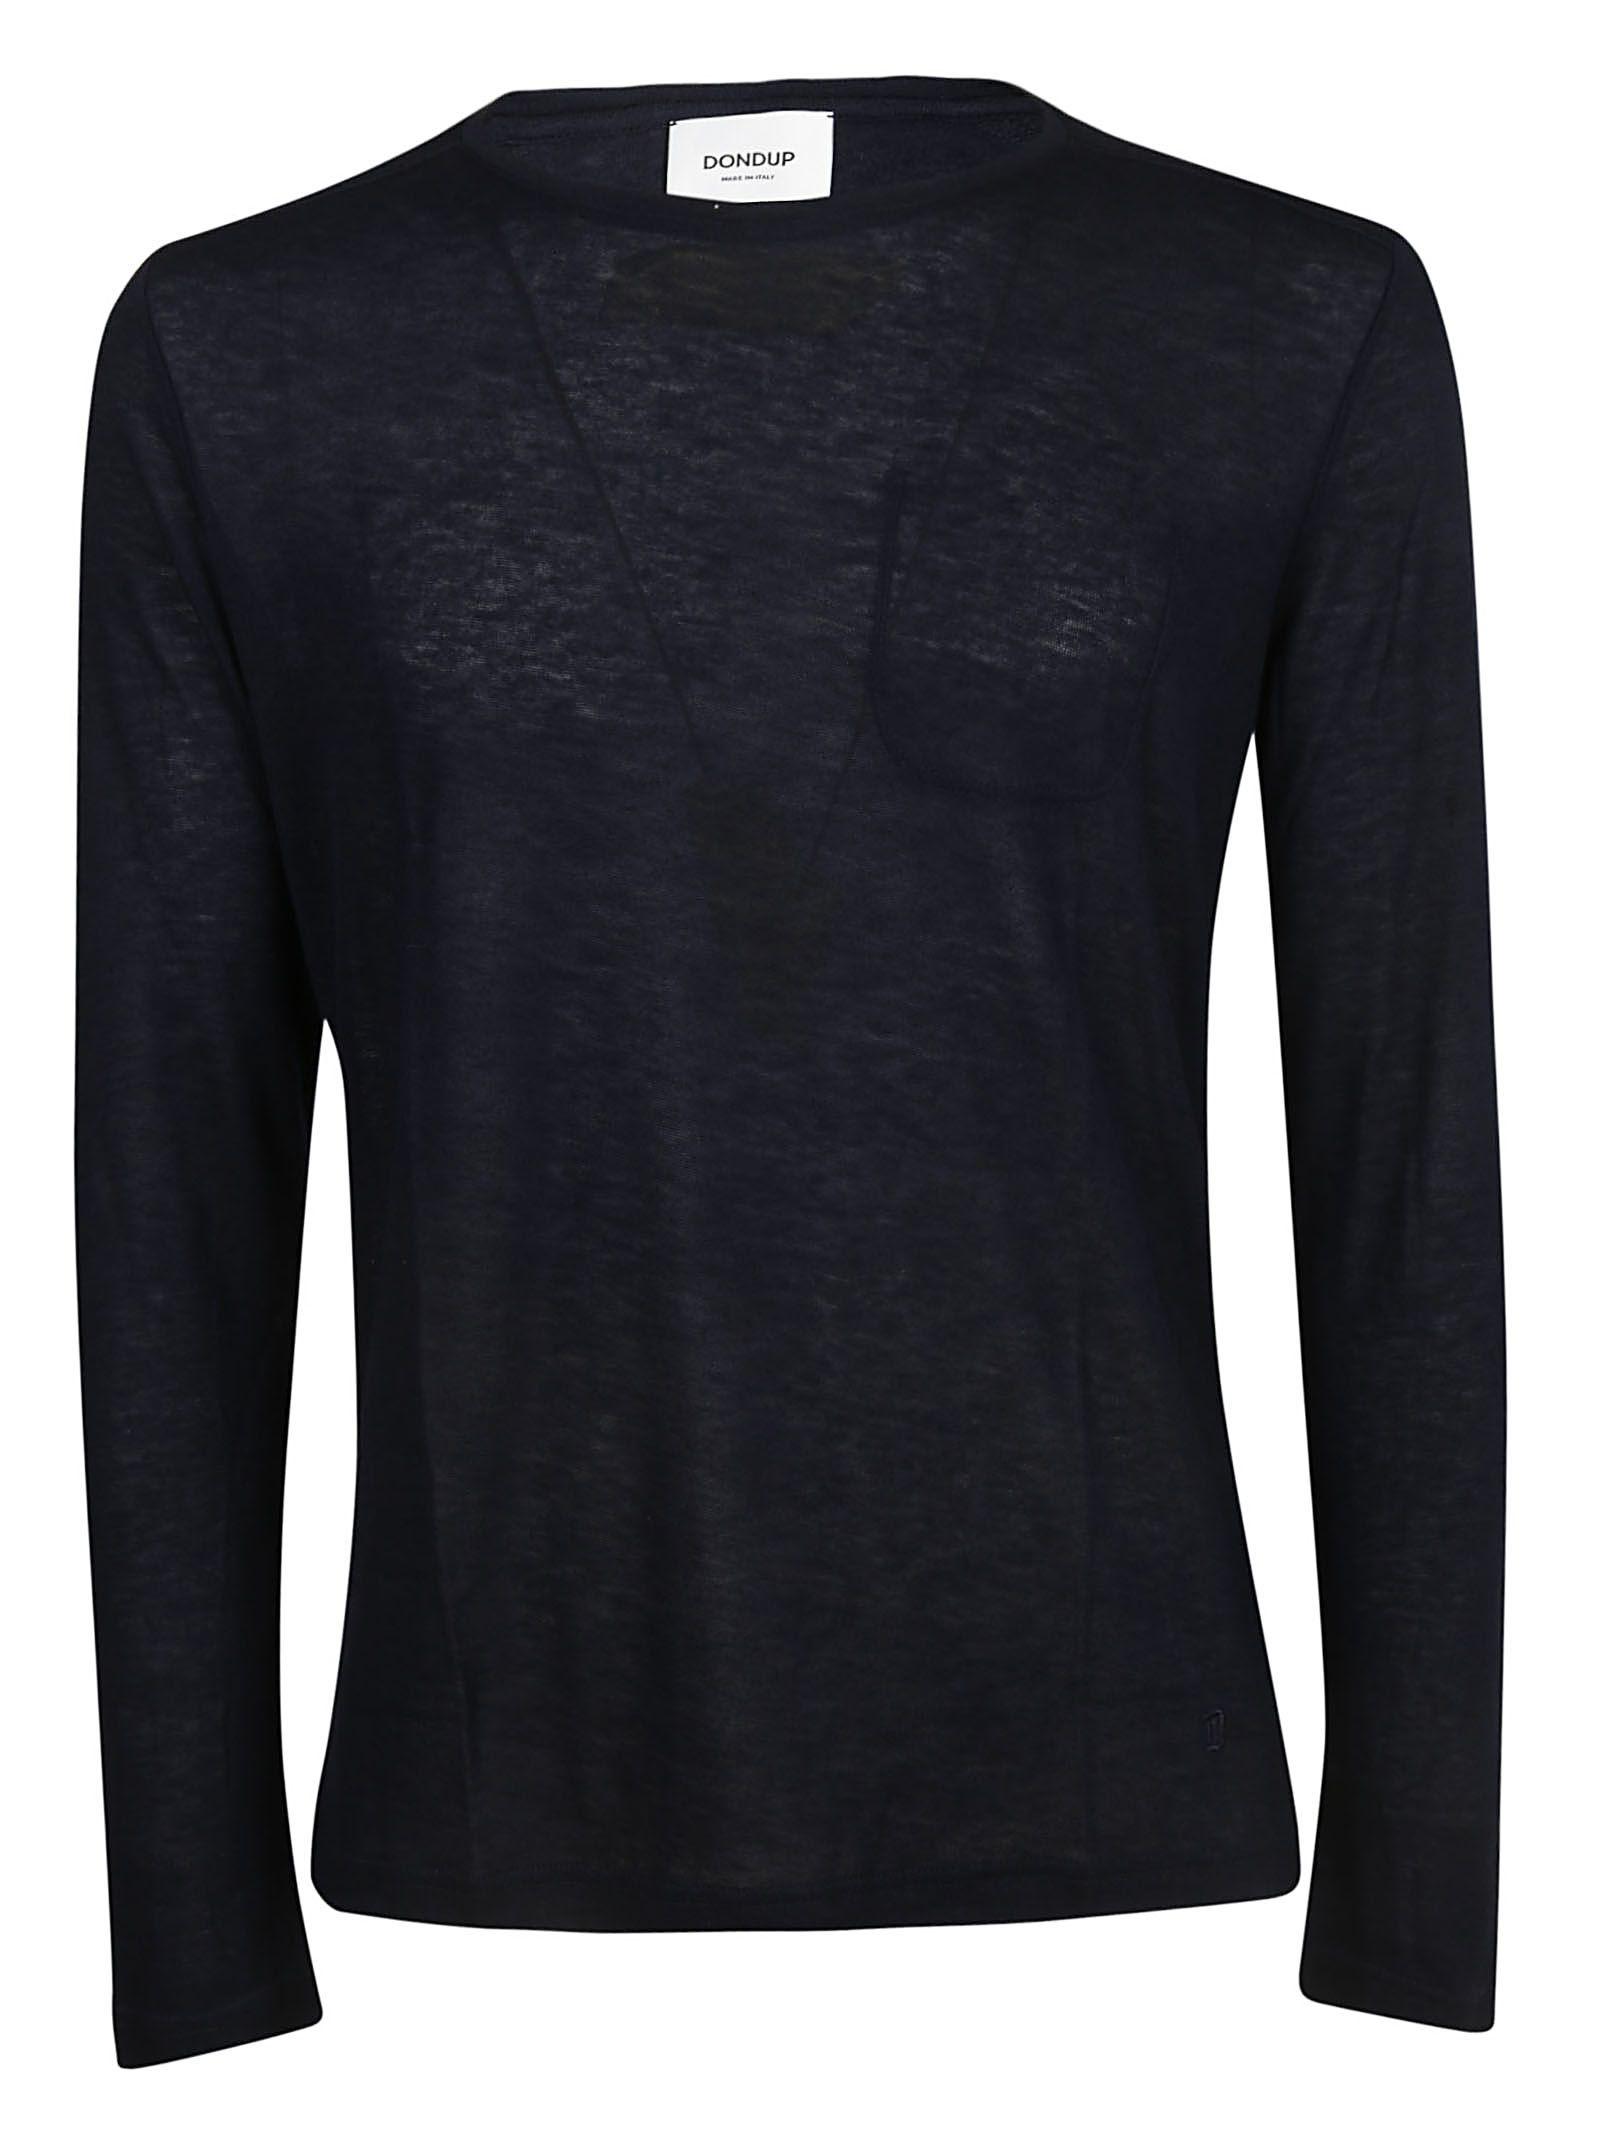 Dondup Longsleeve T-shirt